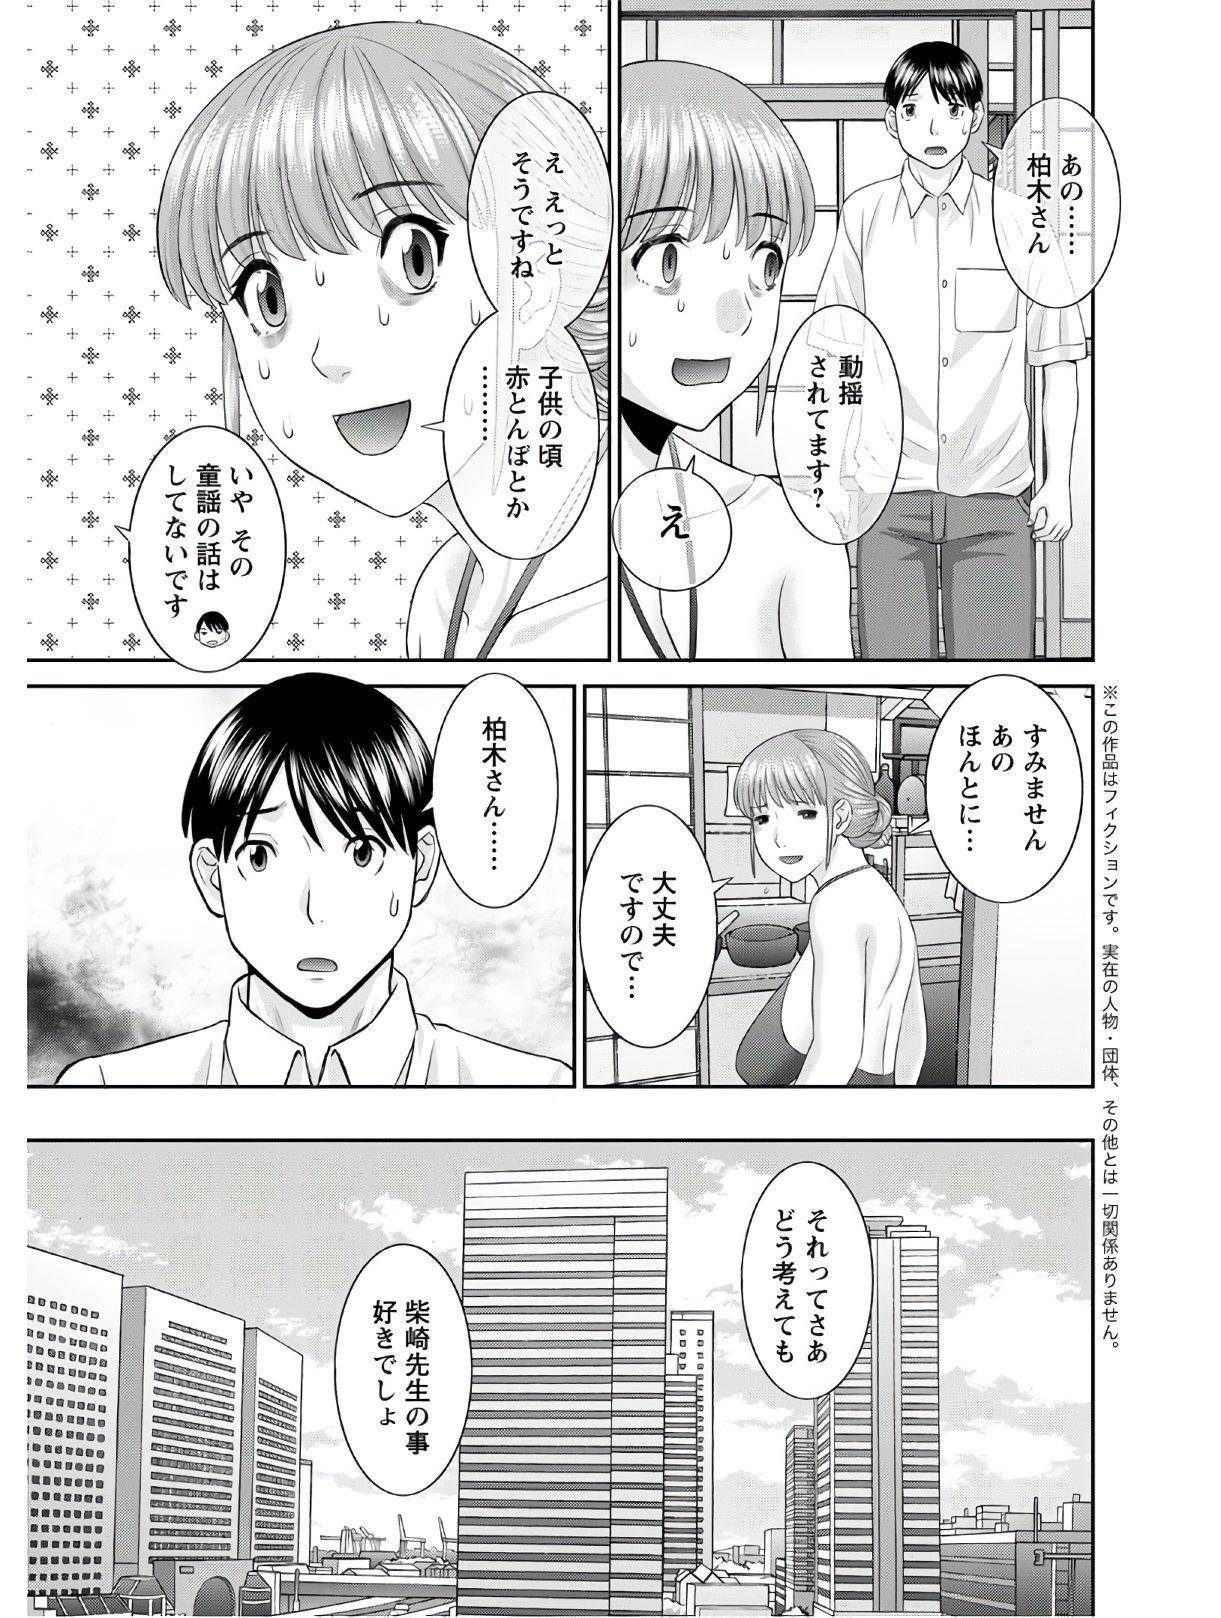 [Kawamori Misaki] Kaikan Hitotsuma Gakuen Ch. 1-6, 8-20 [Digital] 297